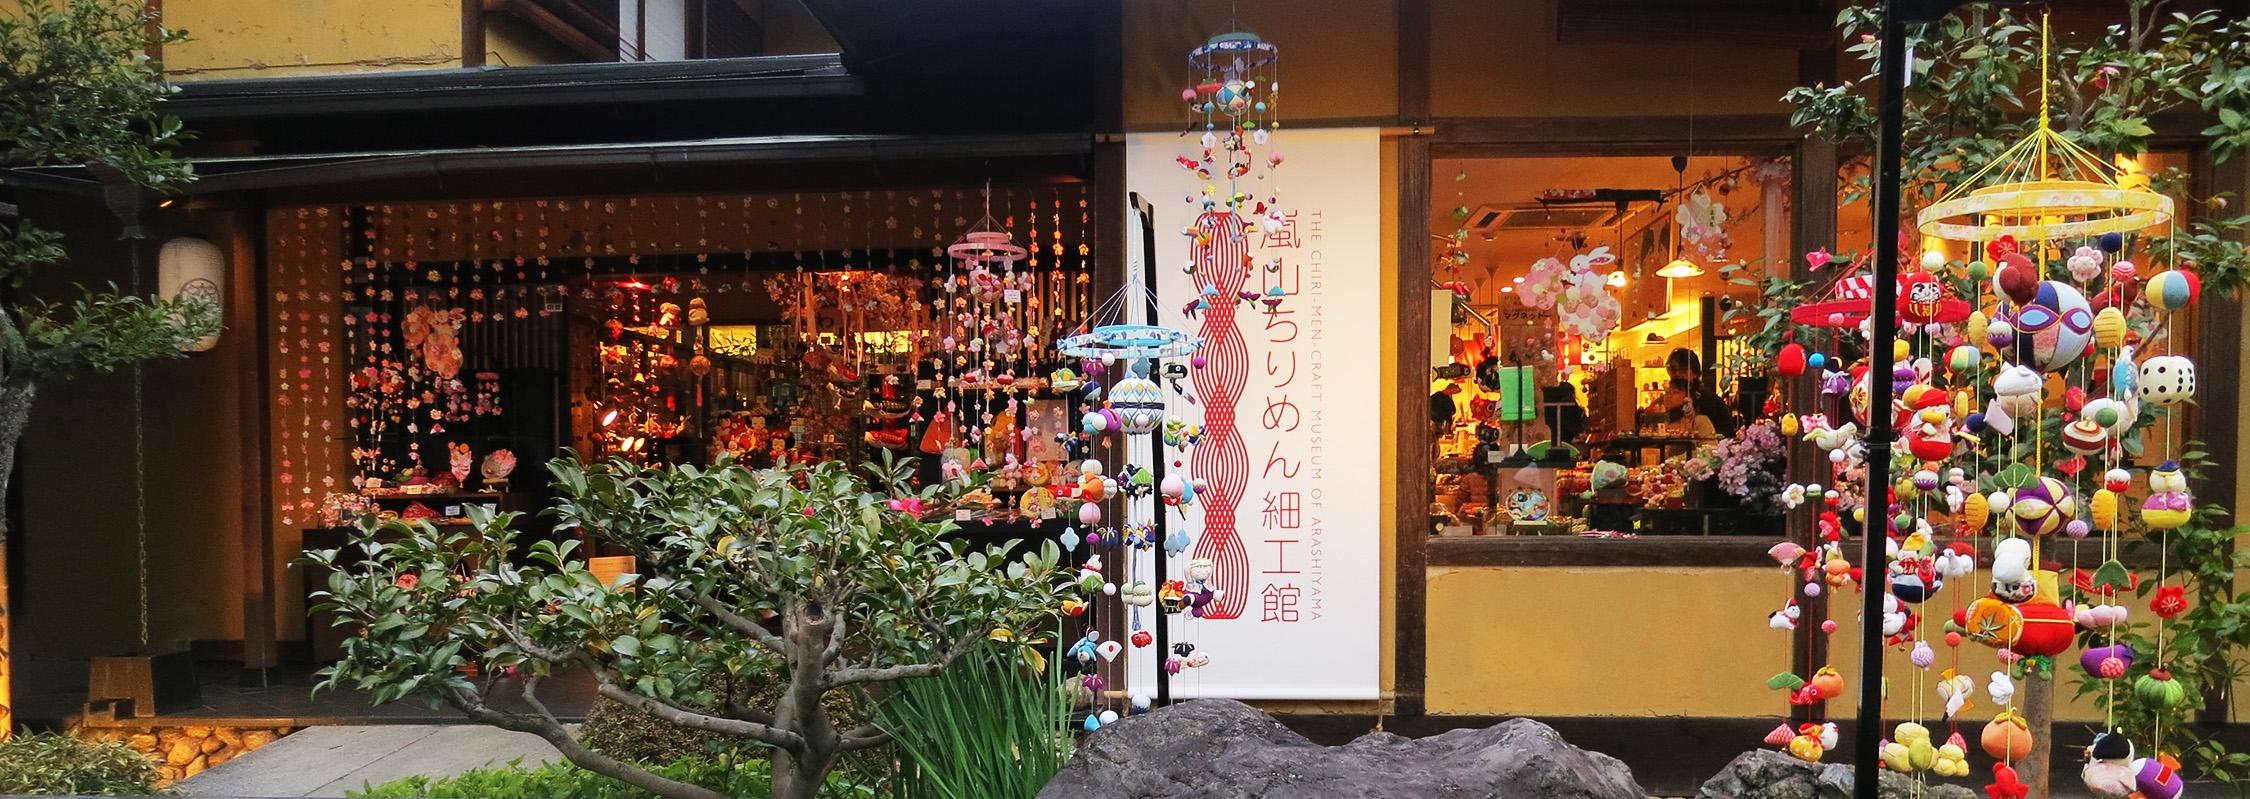 Magasin chirimen japon kyoto